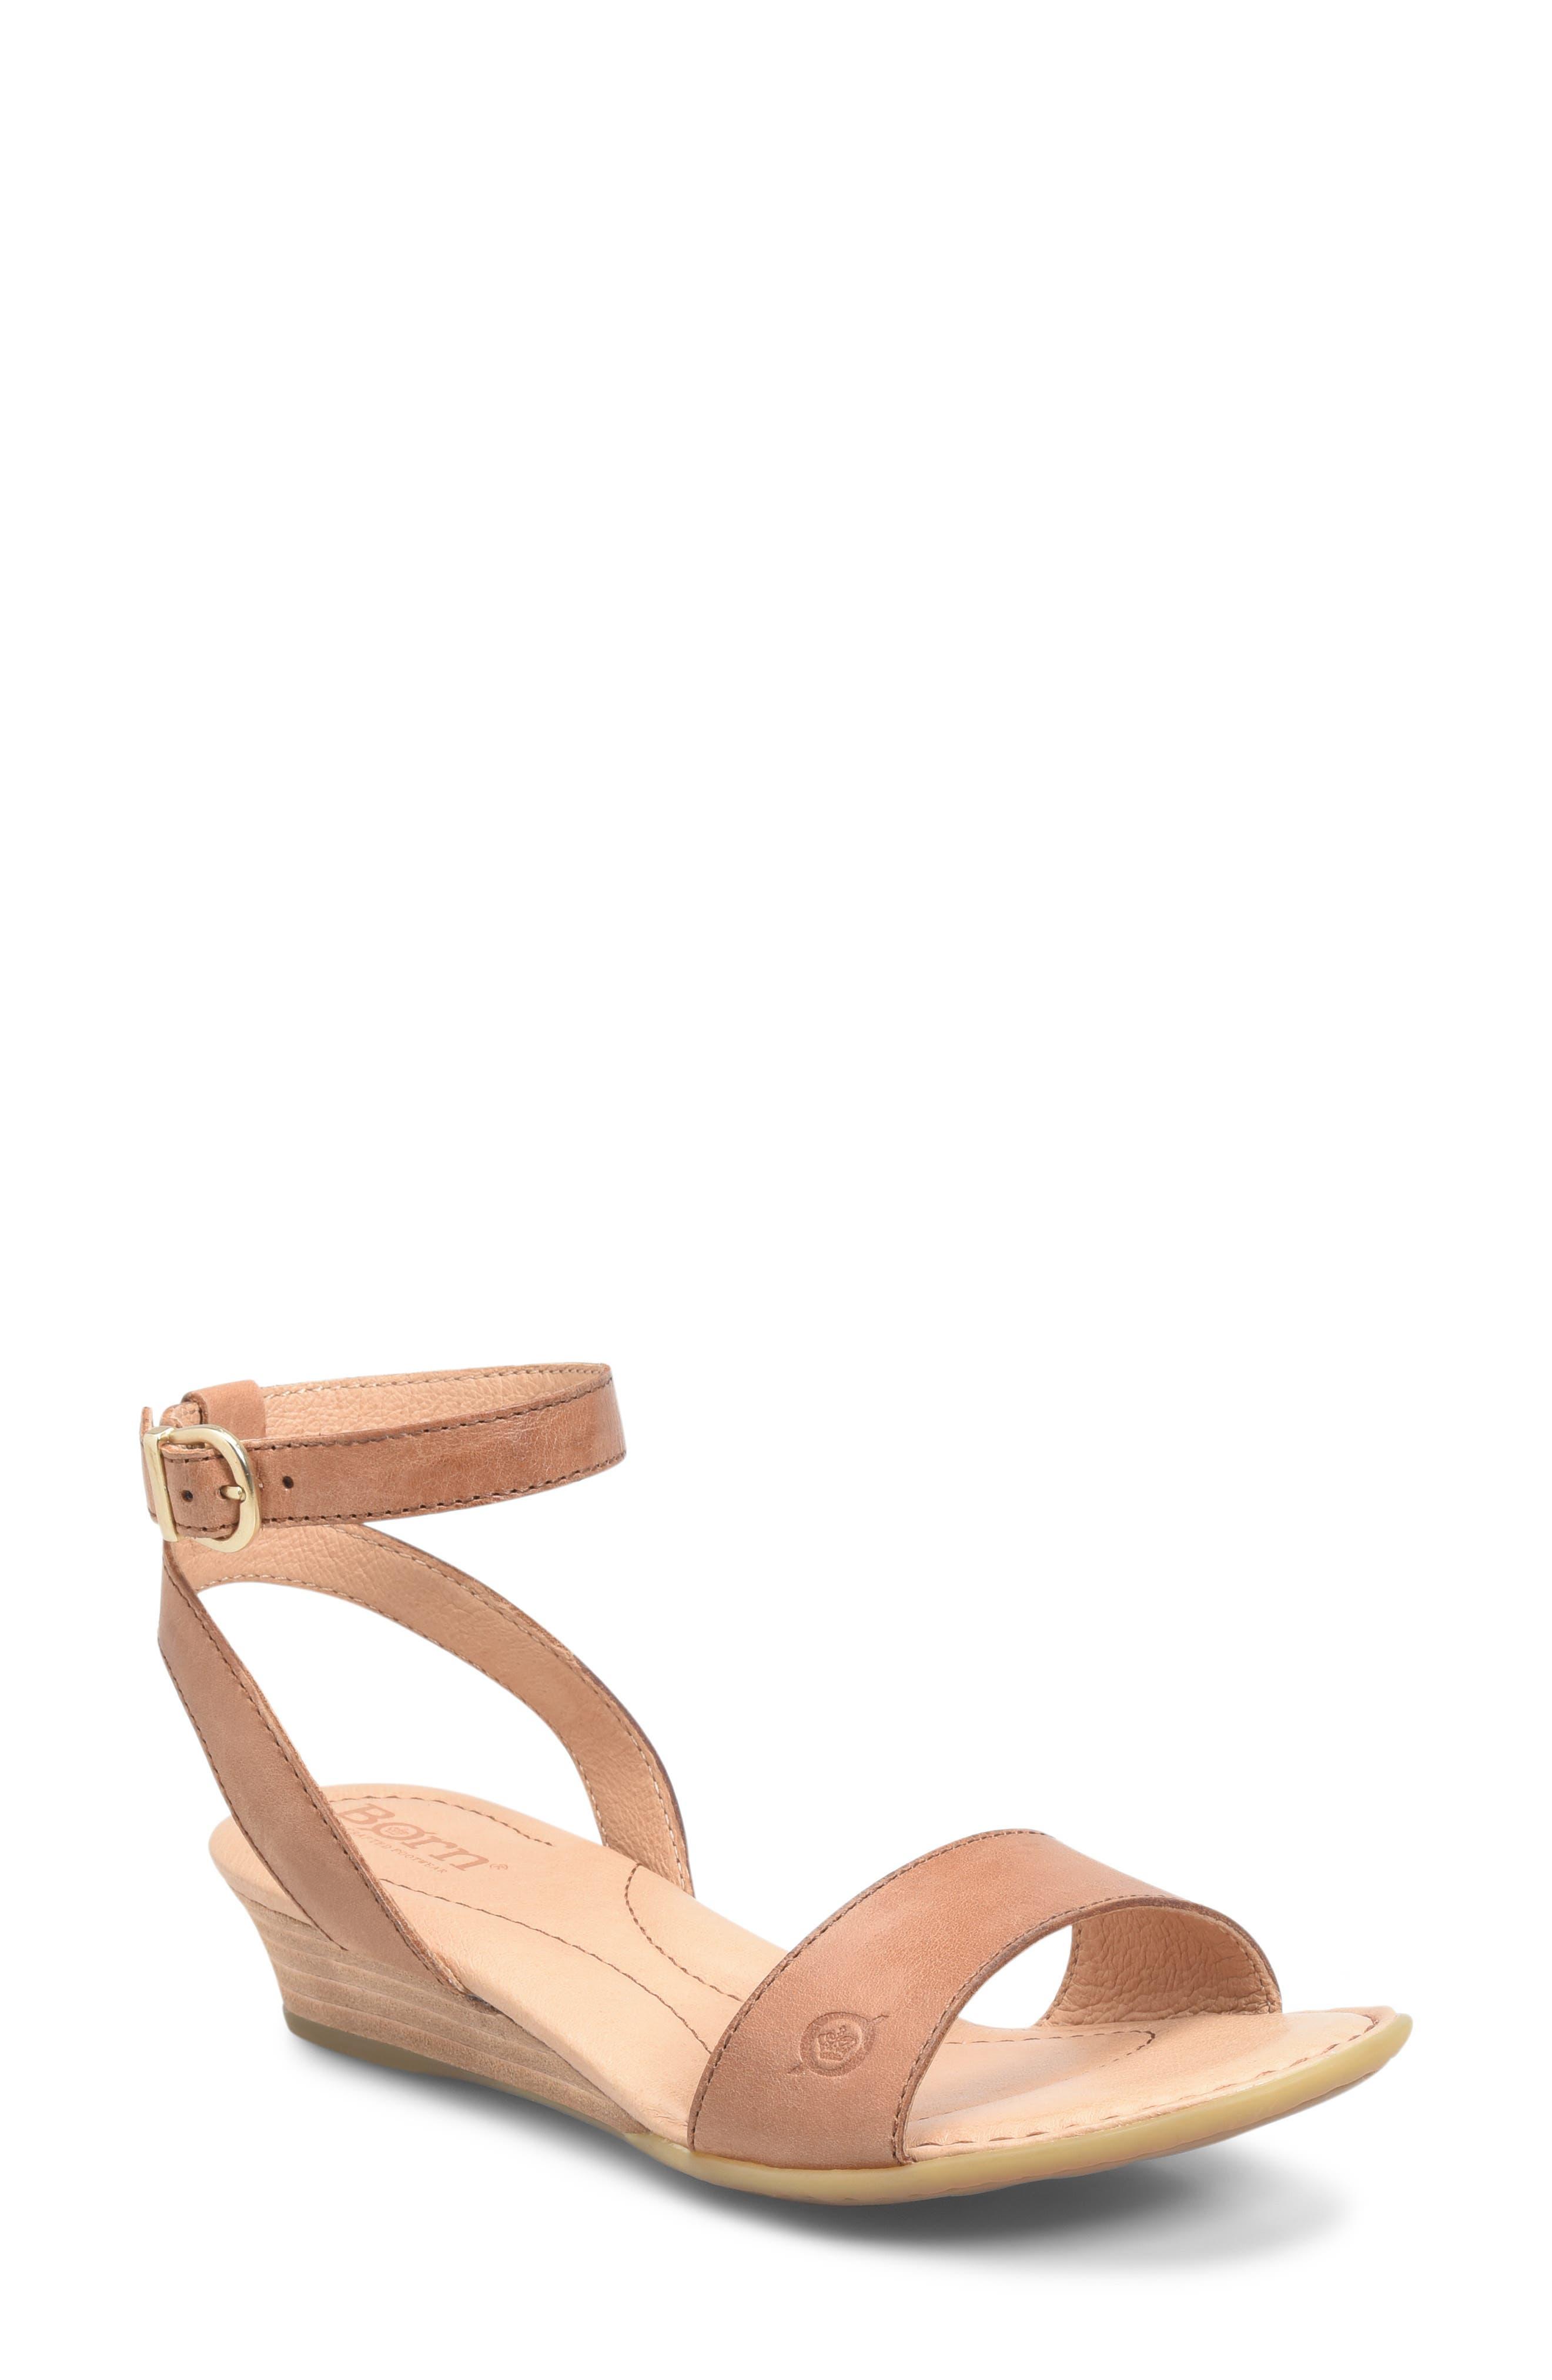 B?rn Sevier Wedge Sandal, Brown